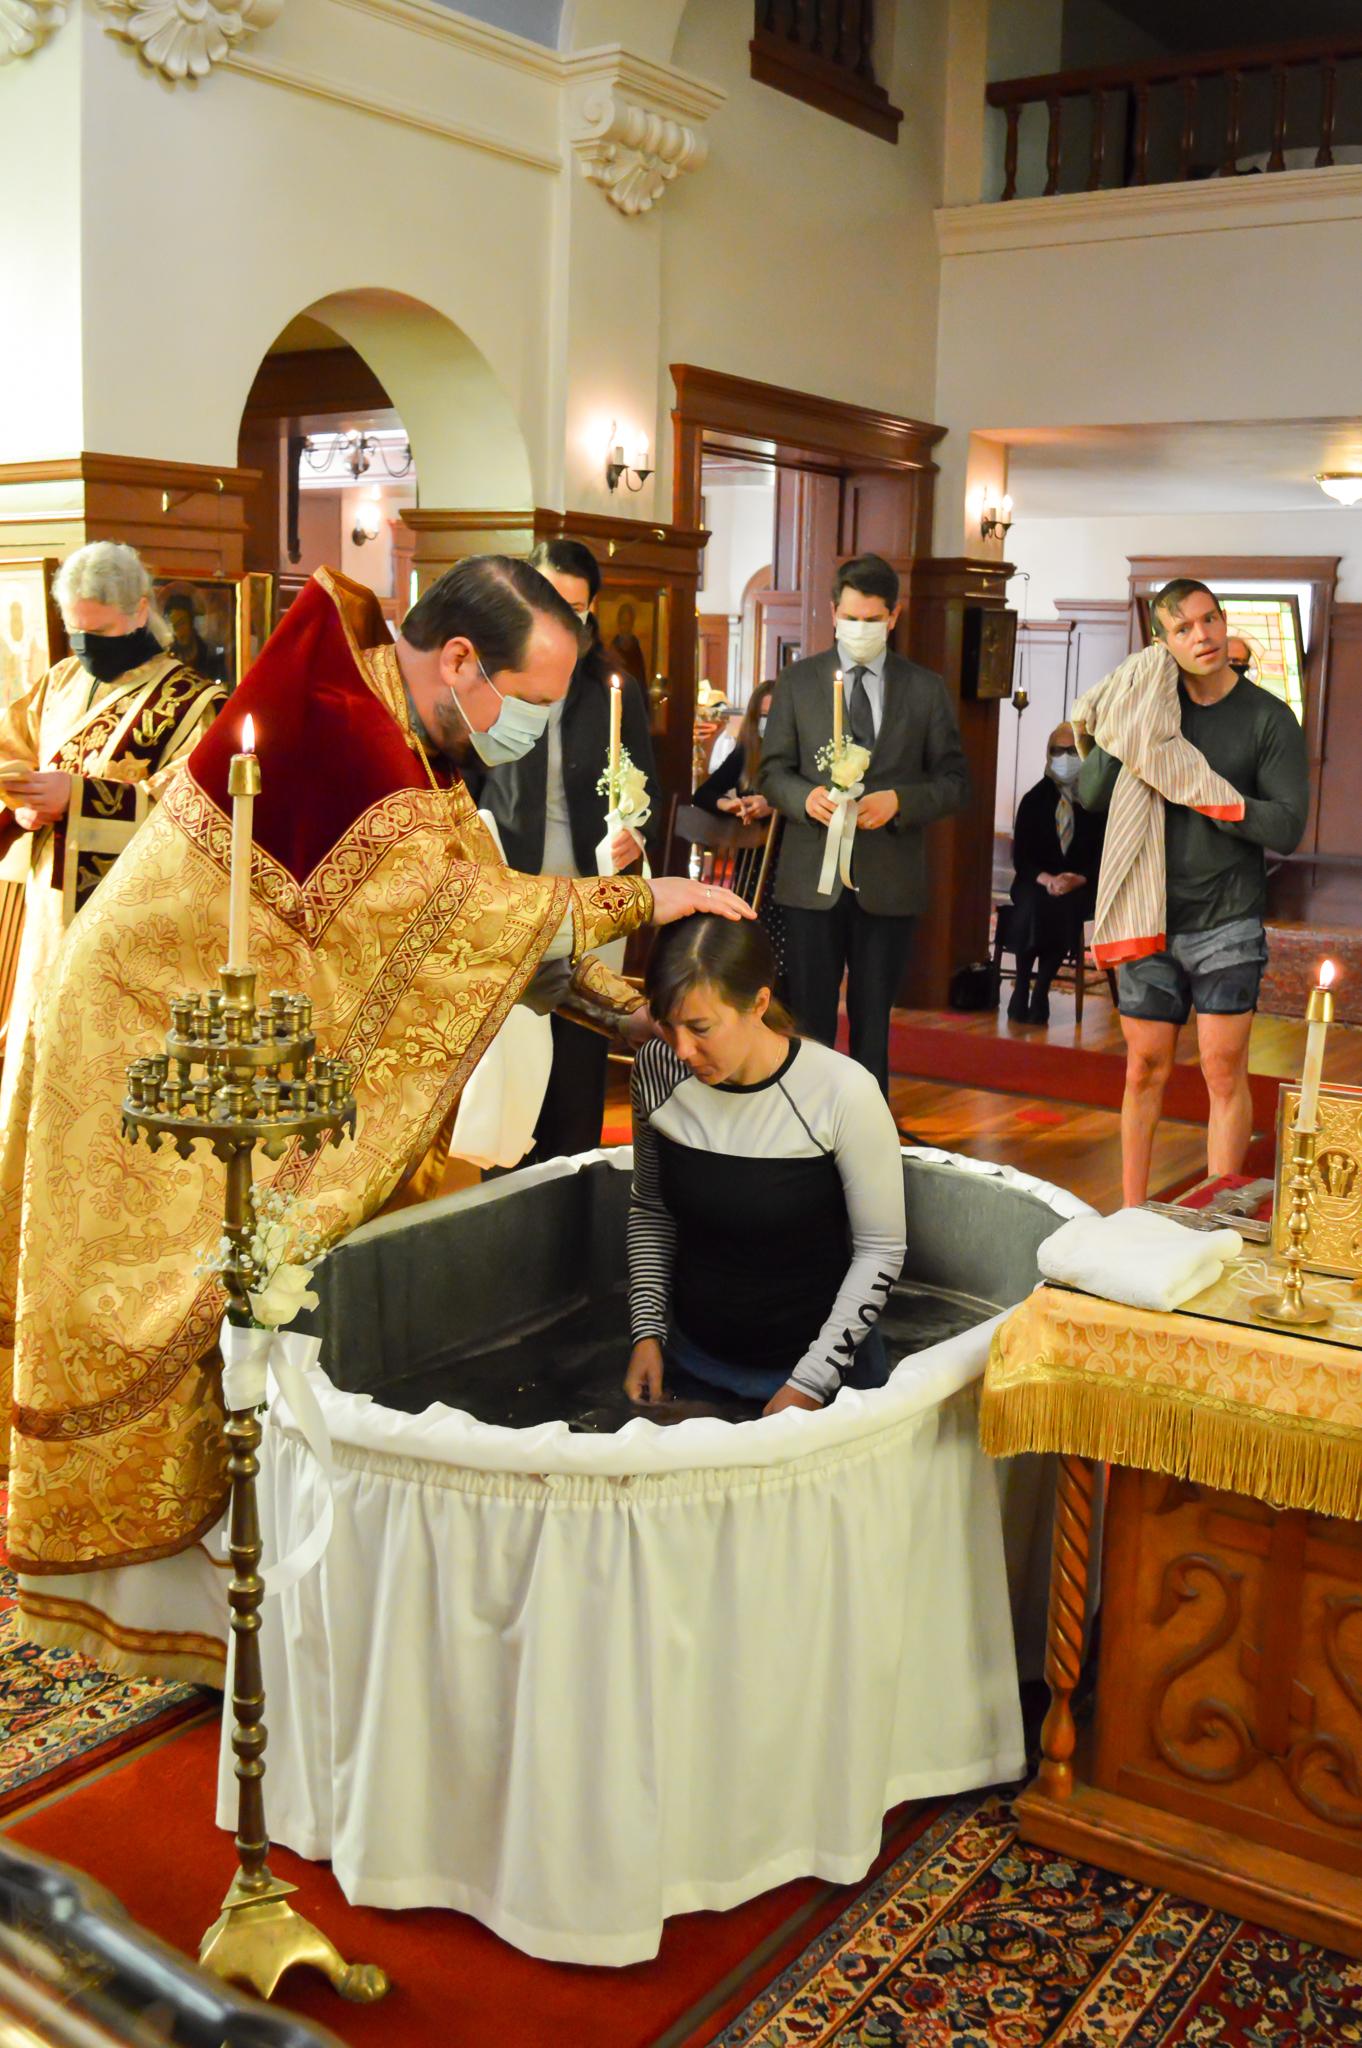 John-and-Alexandra-Baptism-Feb28-28